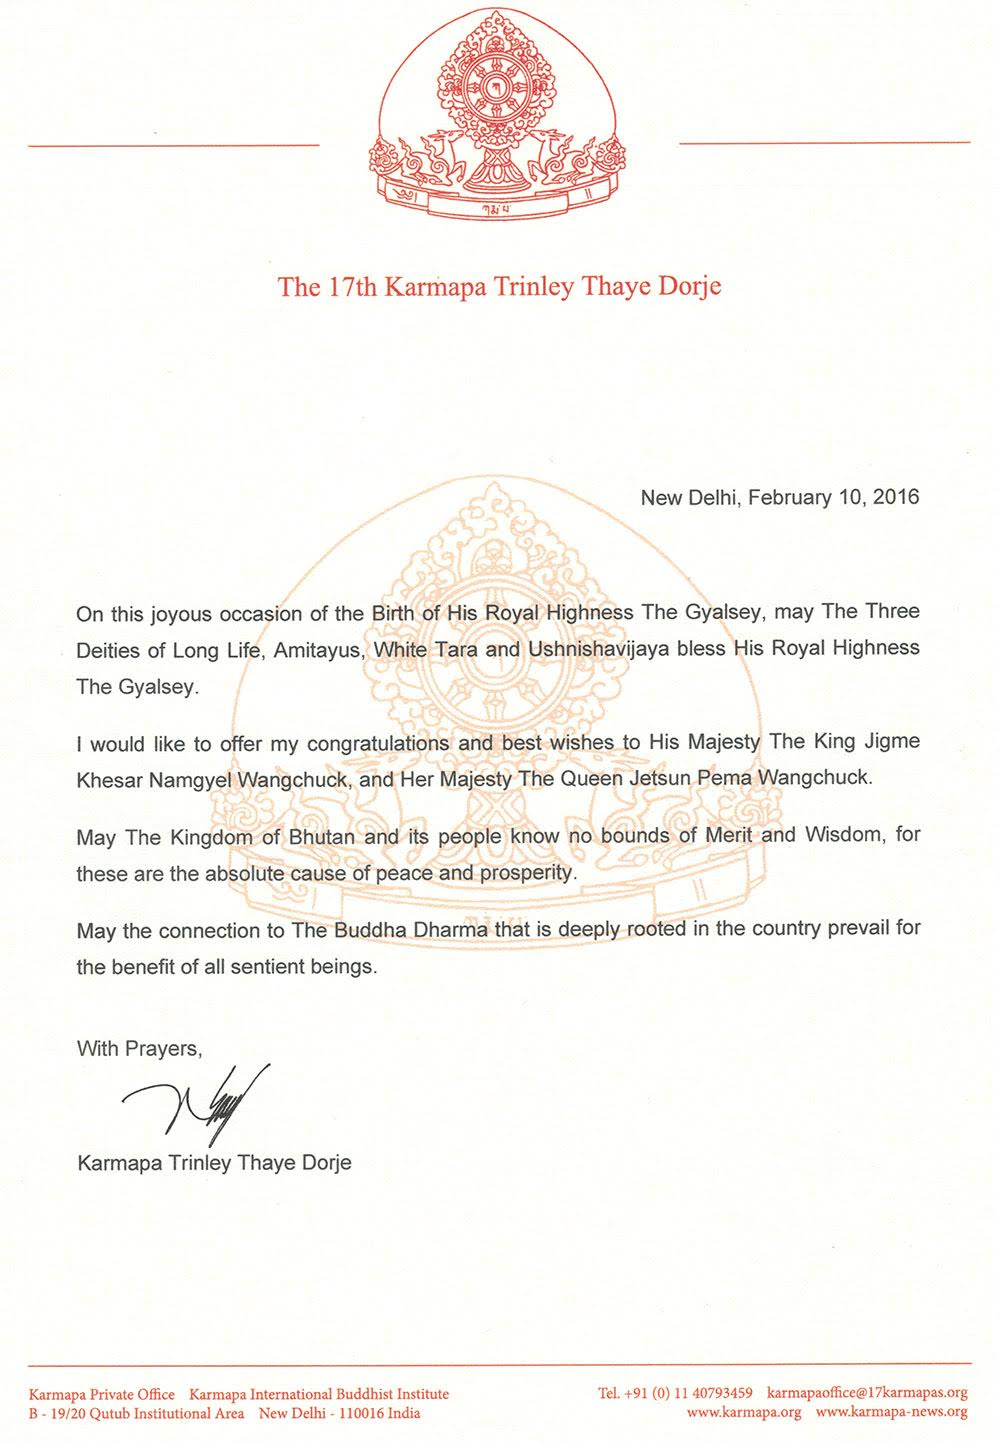 On This Joyous Occasion Of The Birth His Royal Highness Gyalsey May Three Deities Long Life Amitayus White Tara And Ushnishavijaya Bless